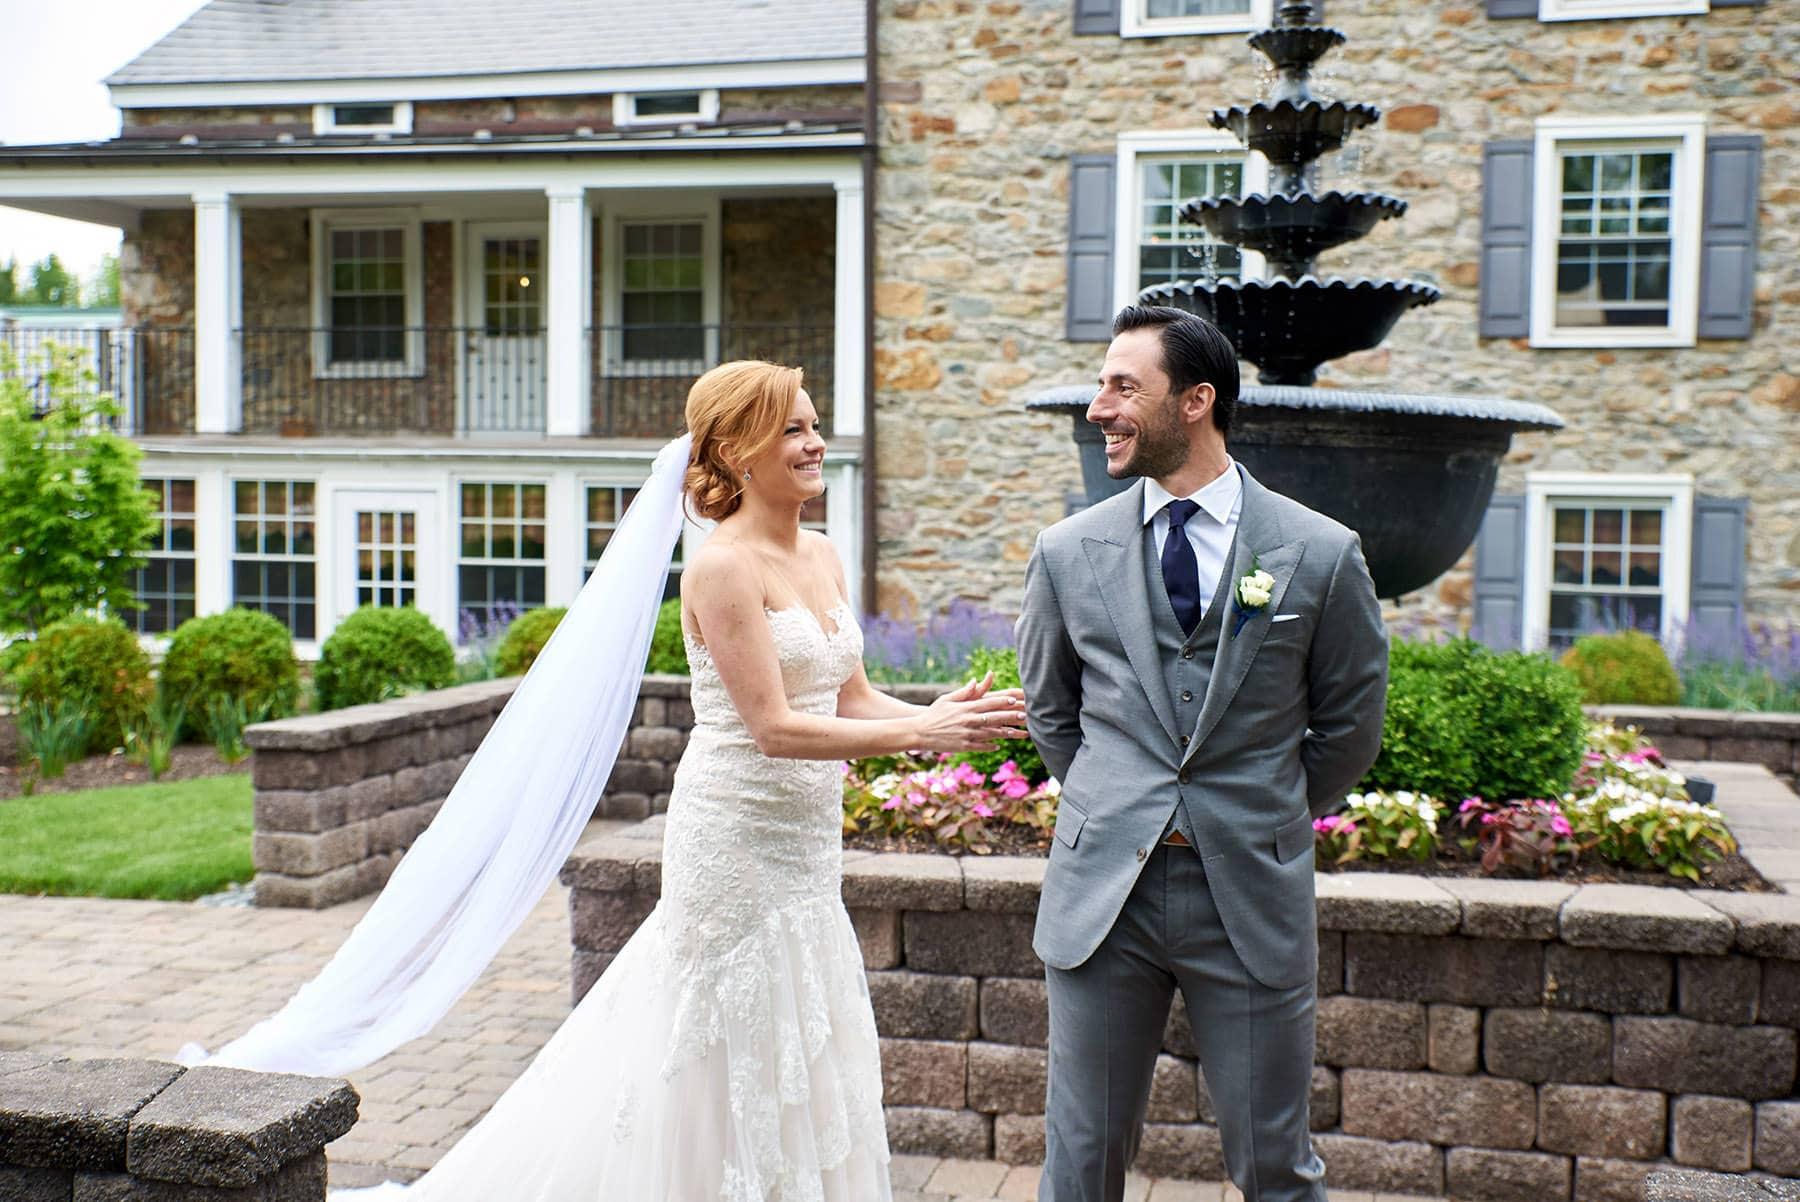 First look wedding photo at the farmhouse in hampton nj